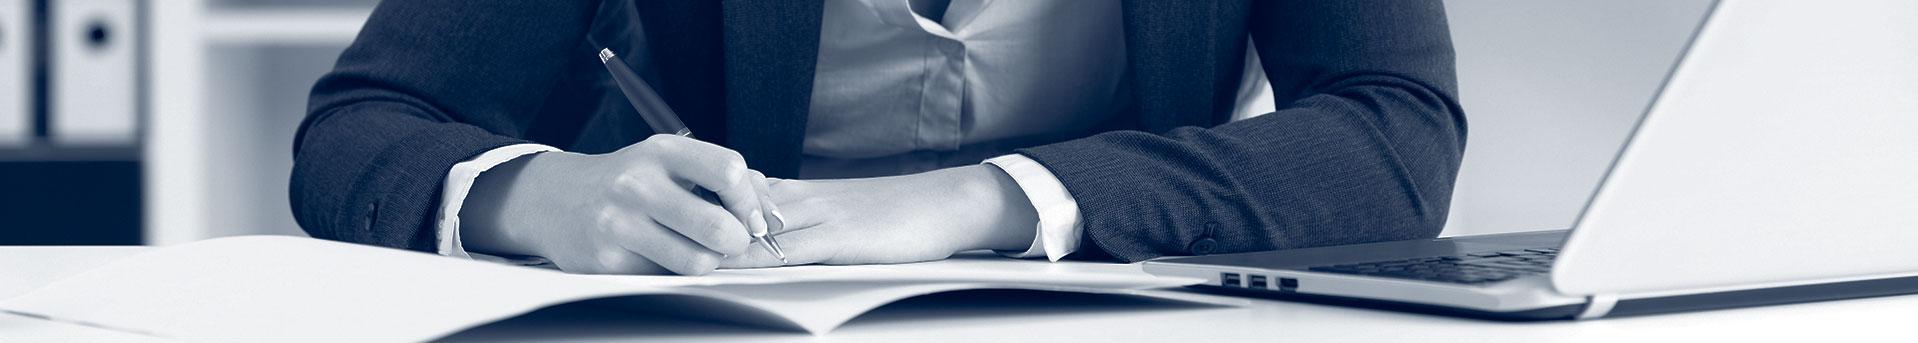 Woman doing paperwork, duotone